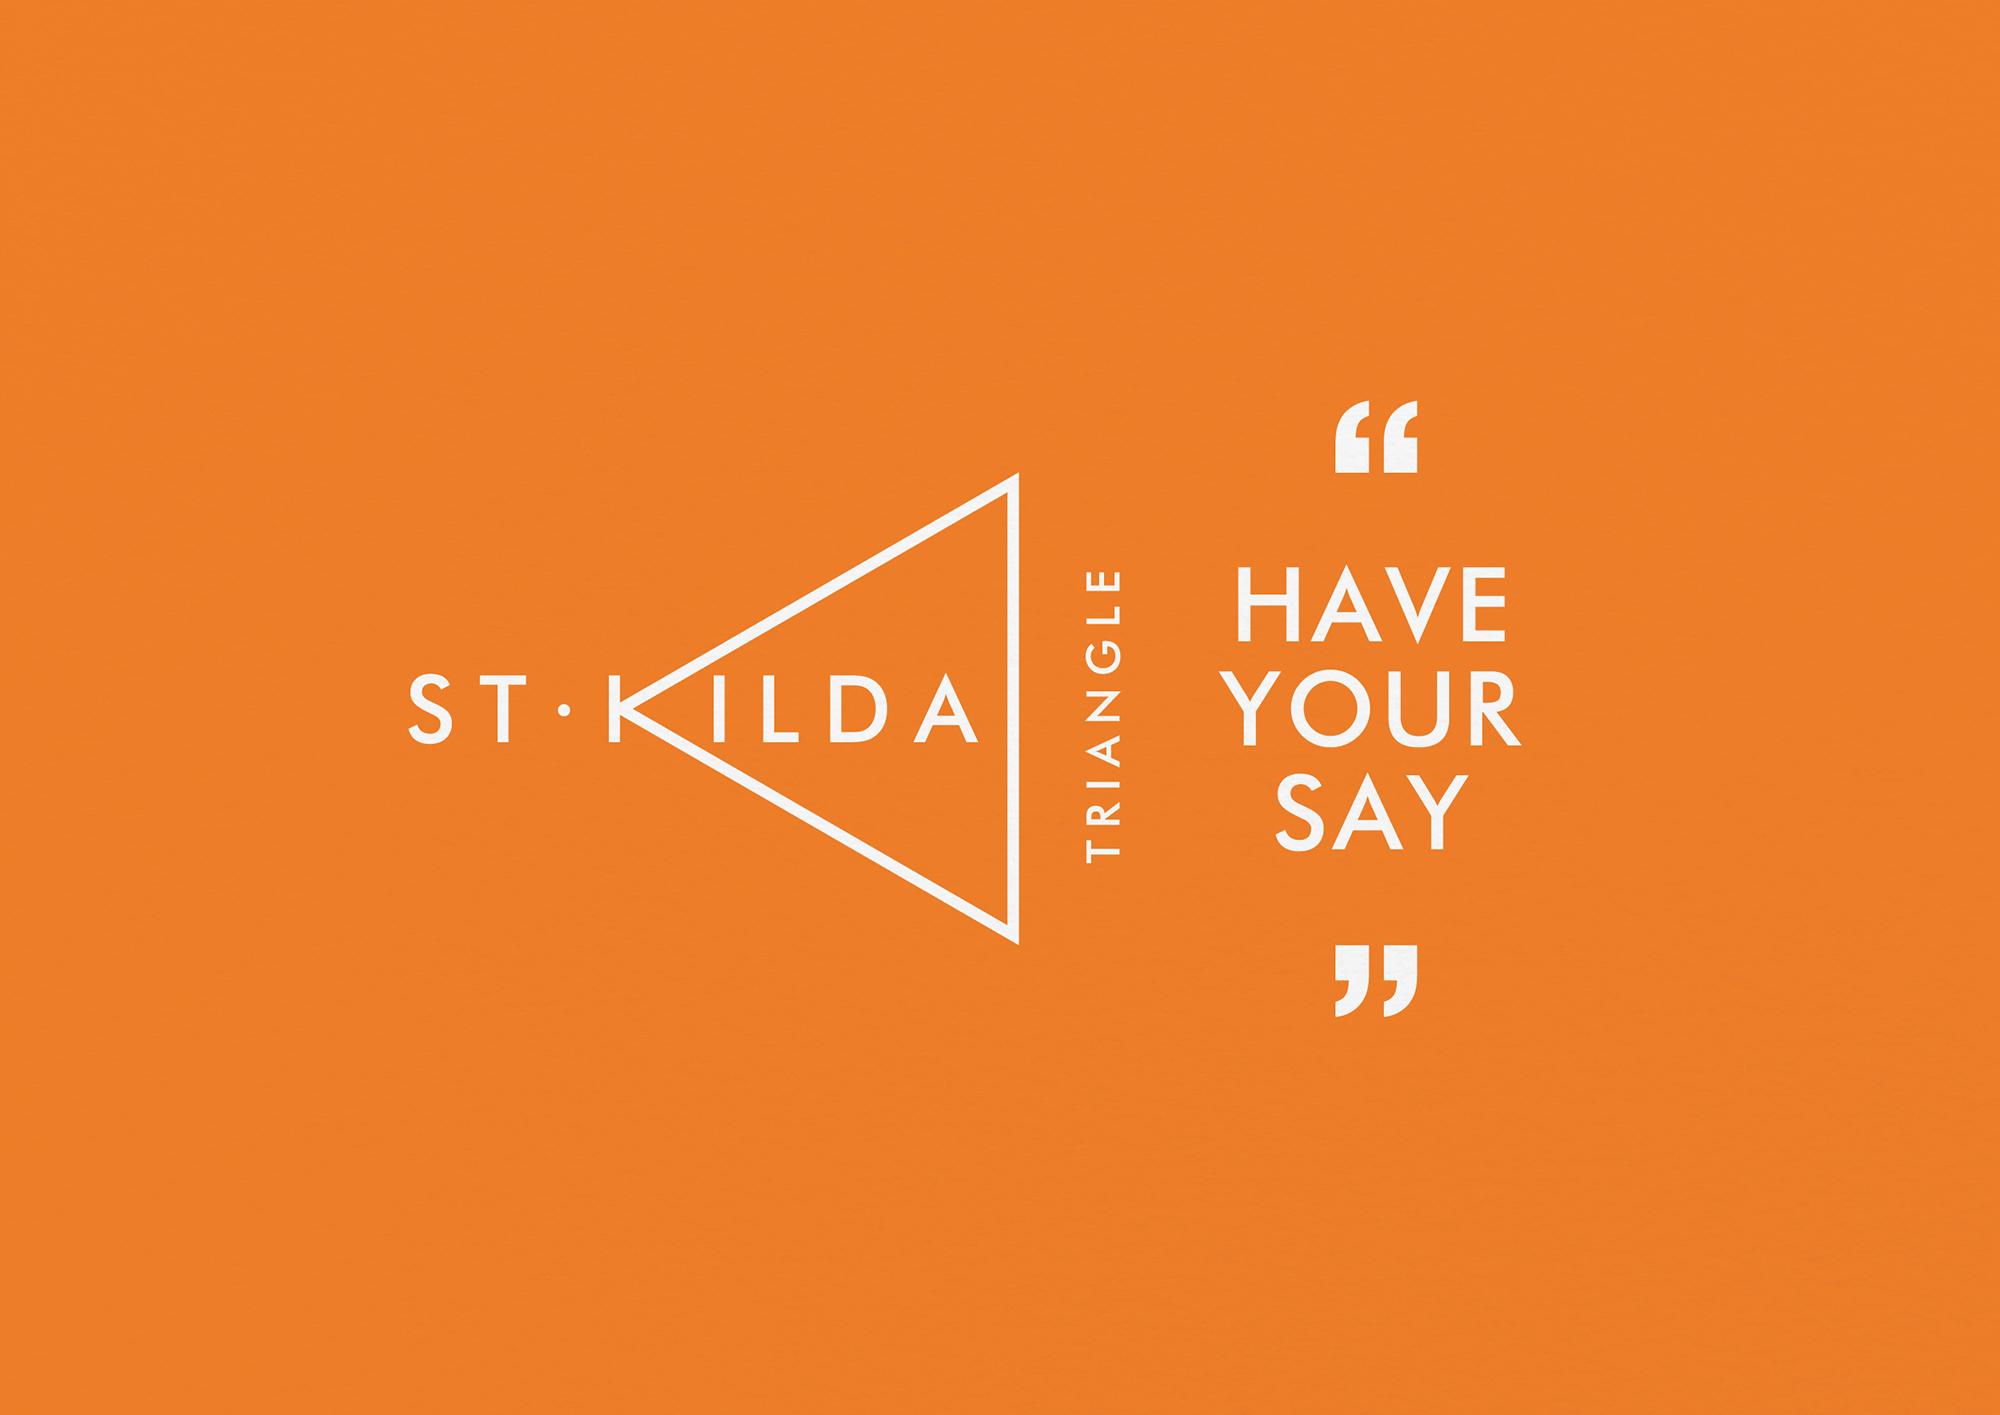 Big_CS_St Kilda Triangle_2017-b-03.jpg